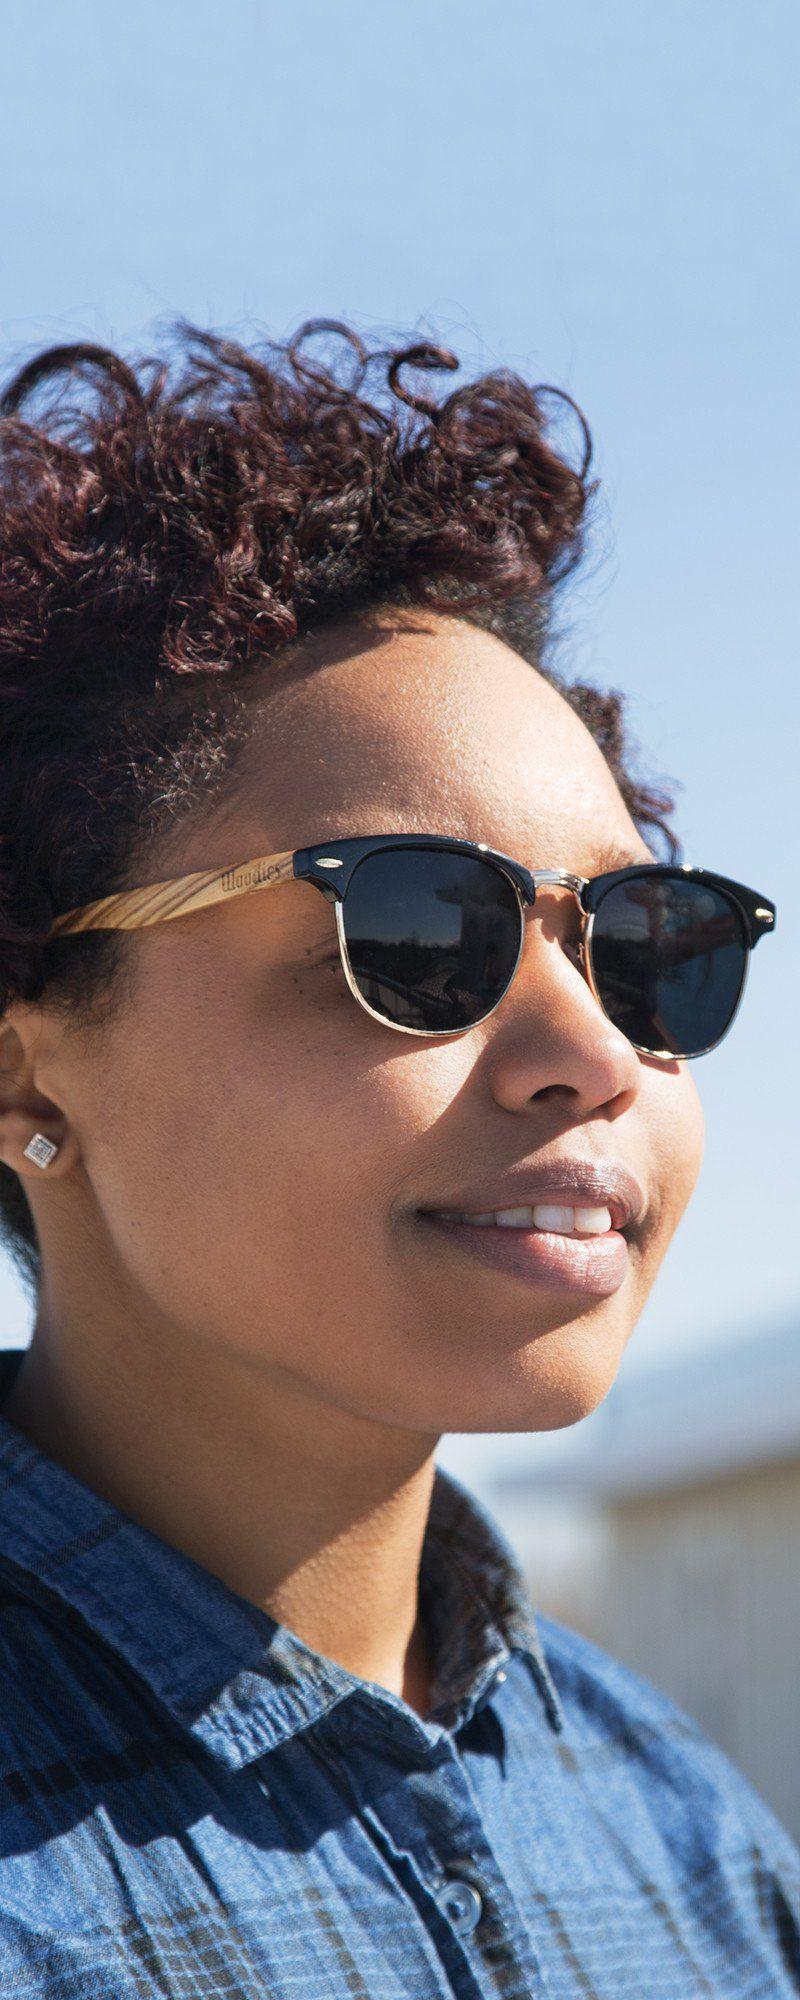 83652afadb Classic sunglasses frames with a natural twist